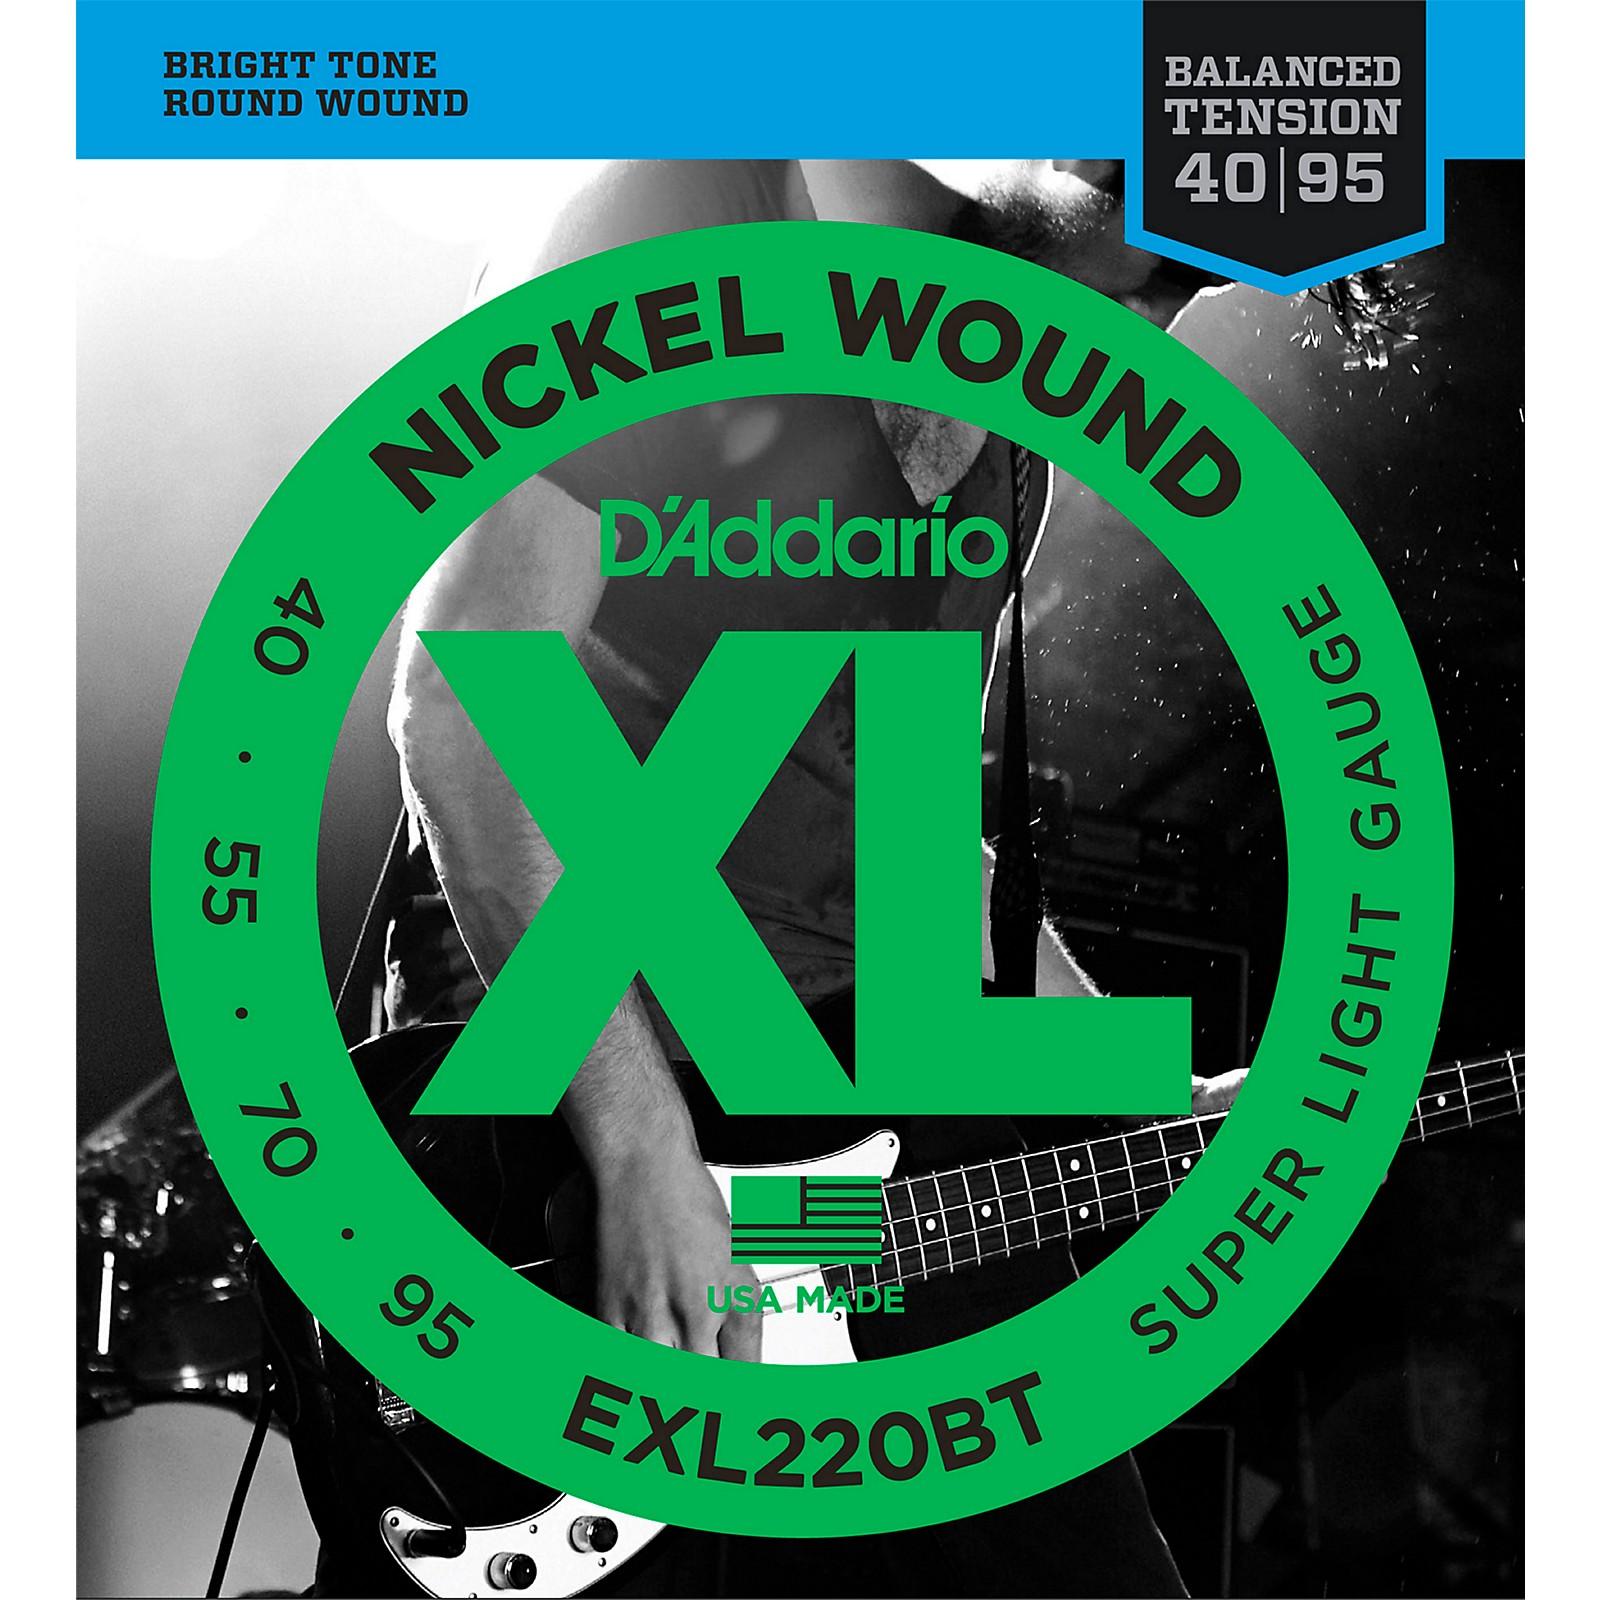 D'Addario EXL220BT Balanced Tension 40-95 Long Scale Electric Bass String Set